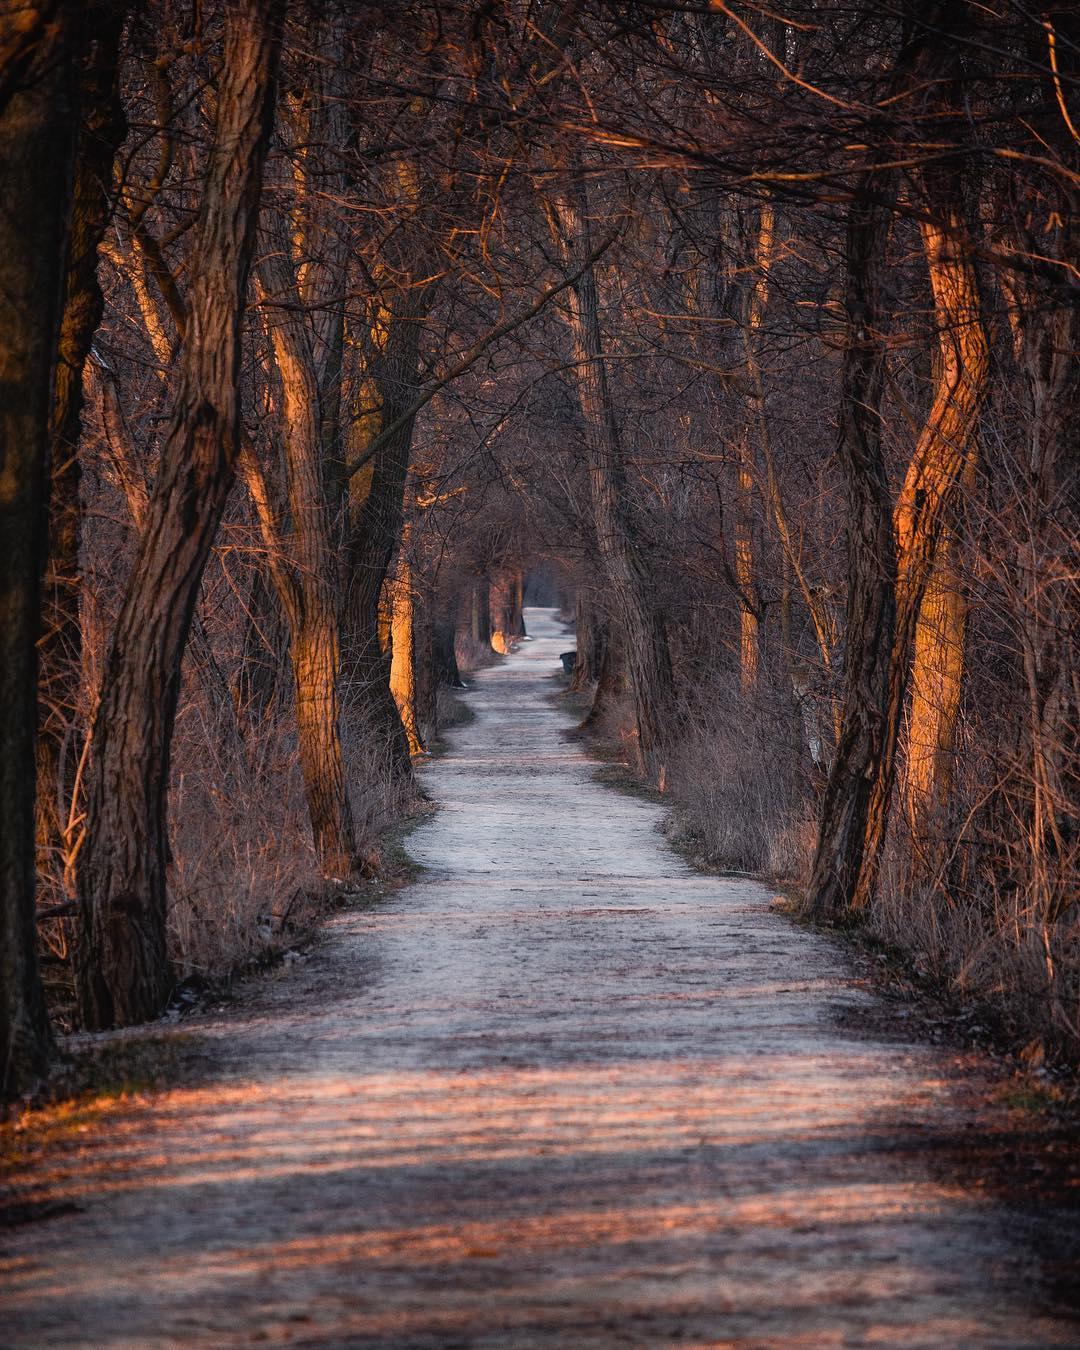 Красота природы и путешествия на снимках Логана Брауна